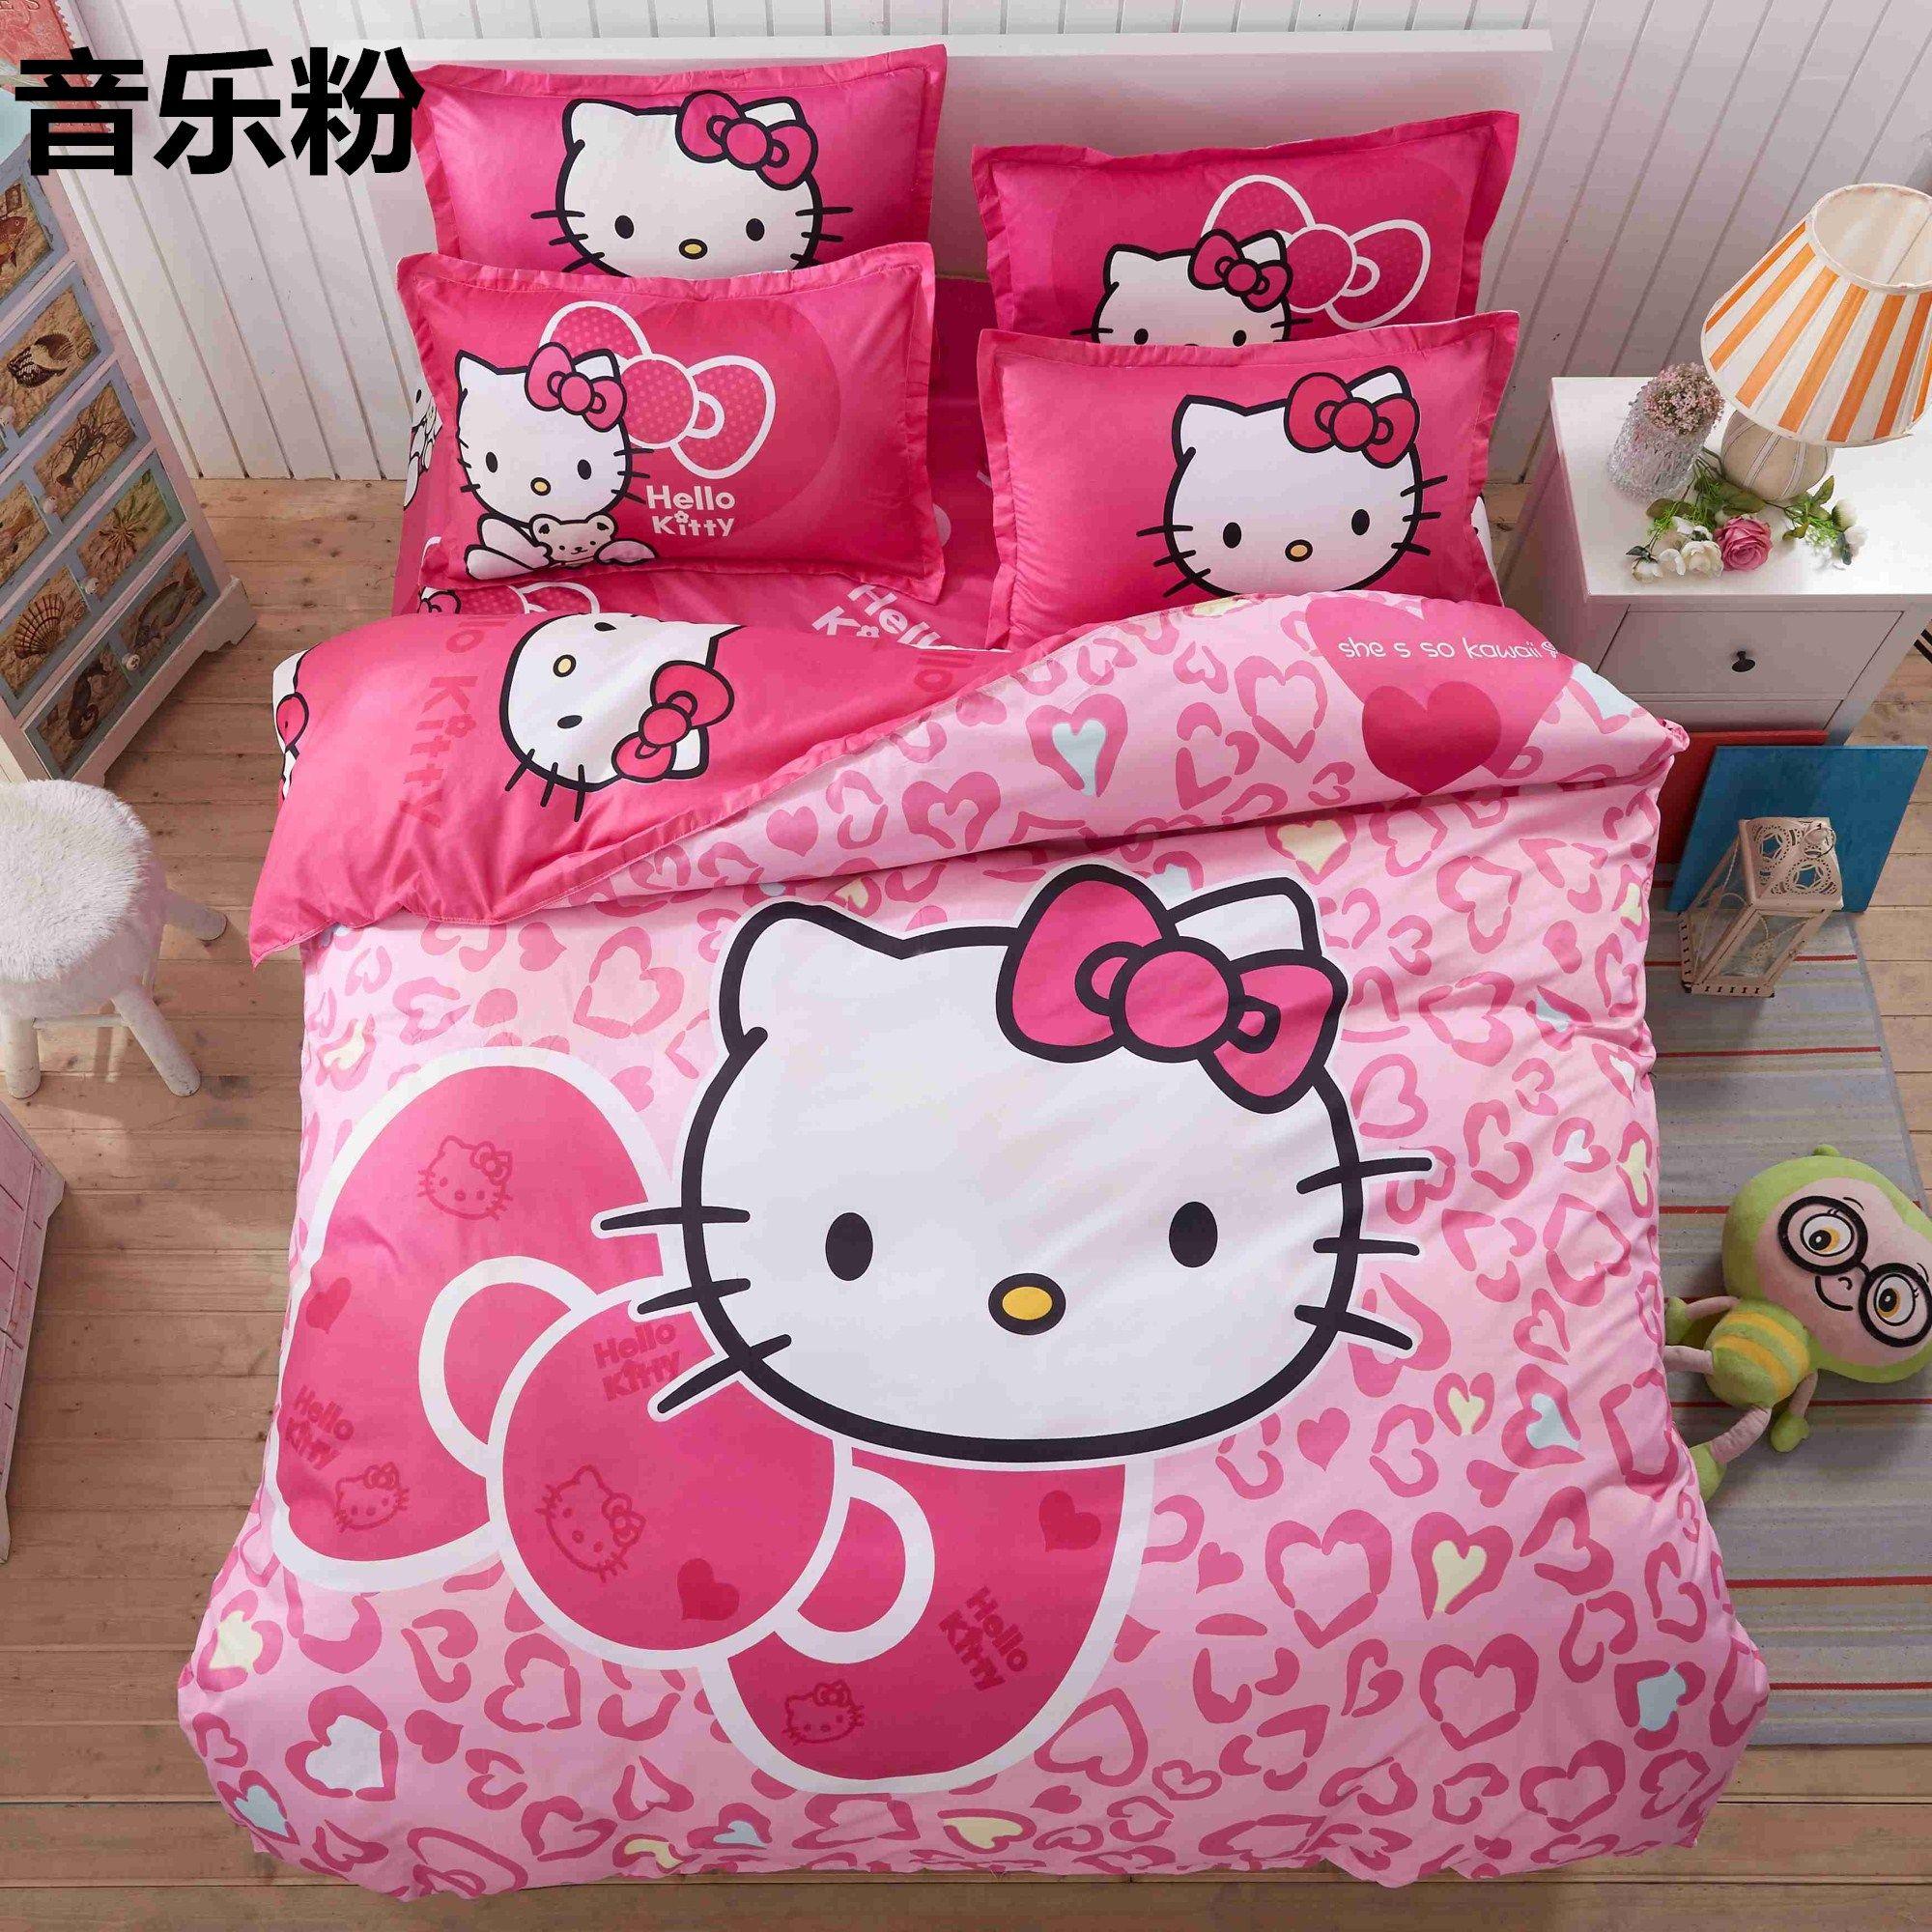 Home Textile Hello Kitty Bedding Set Cartoon Cotton Bed ...